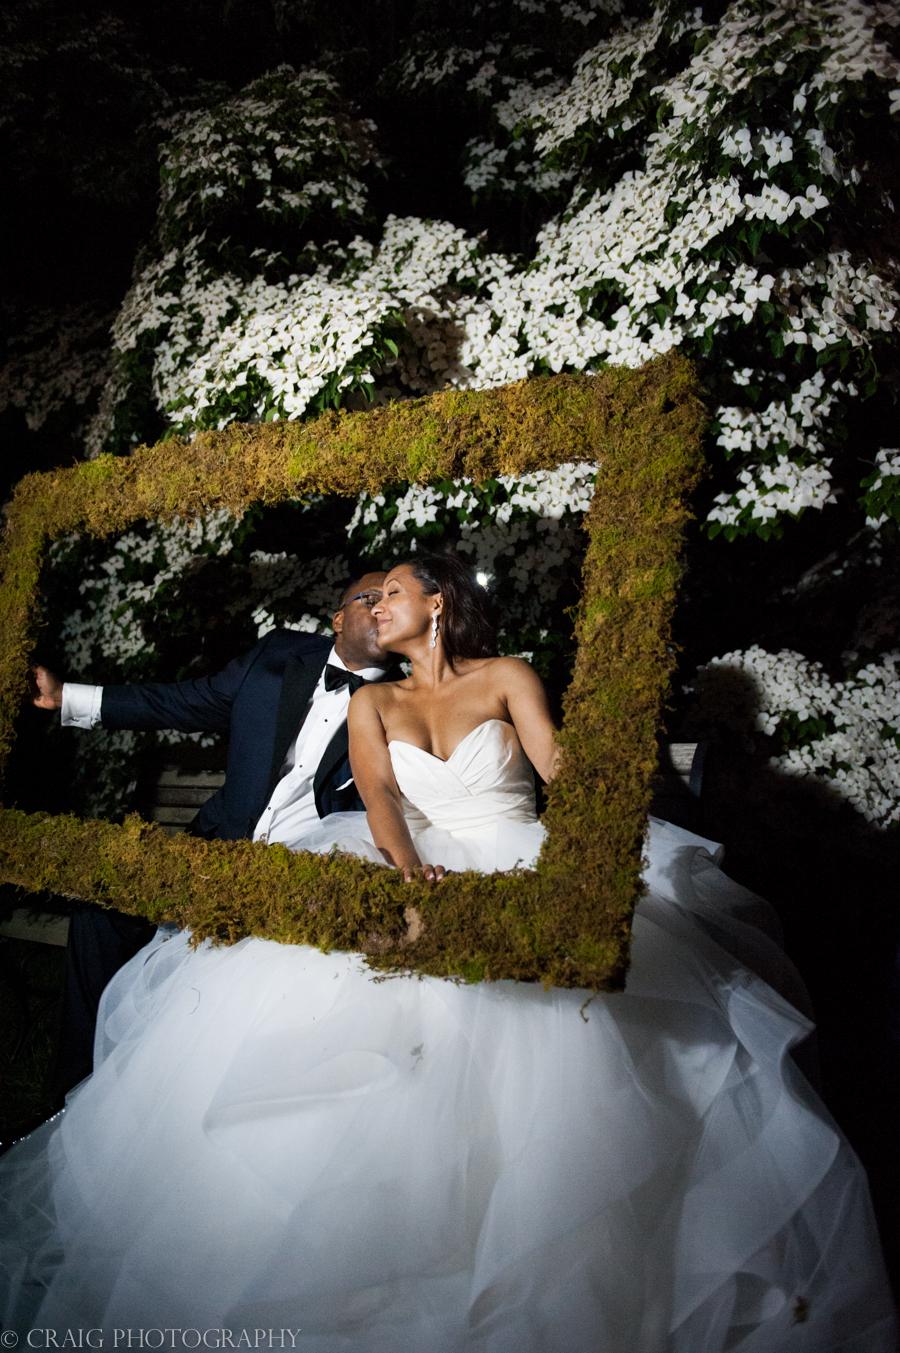 Phipps Conseratory Weddings | Wedding Photo Booth Homemade Moss Frame-0014